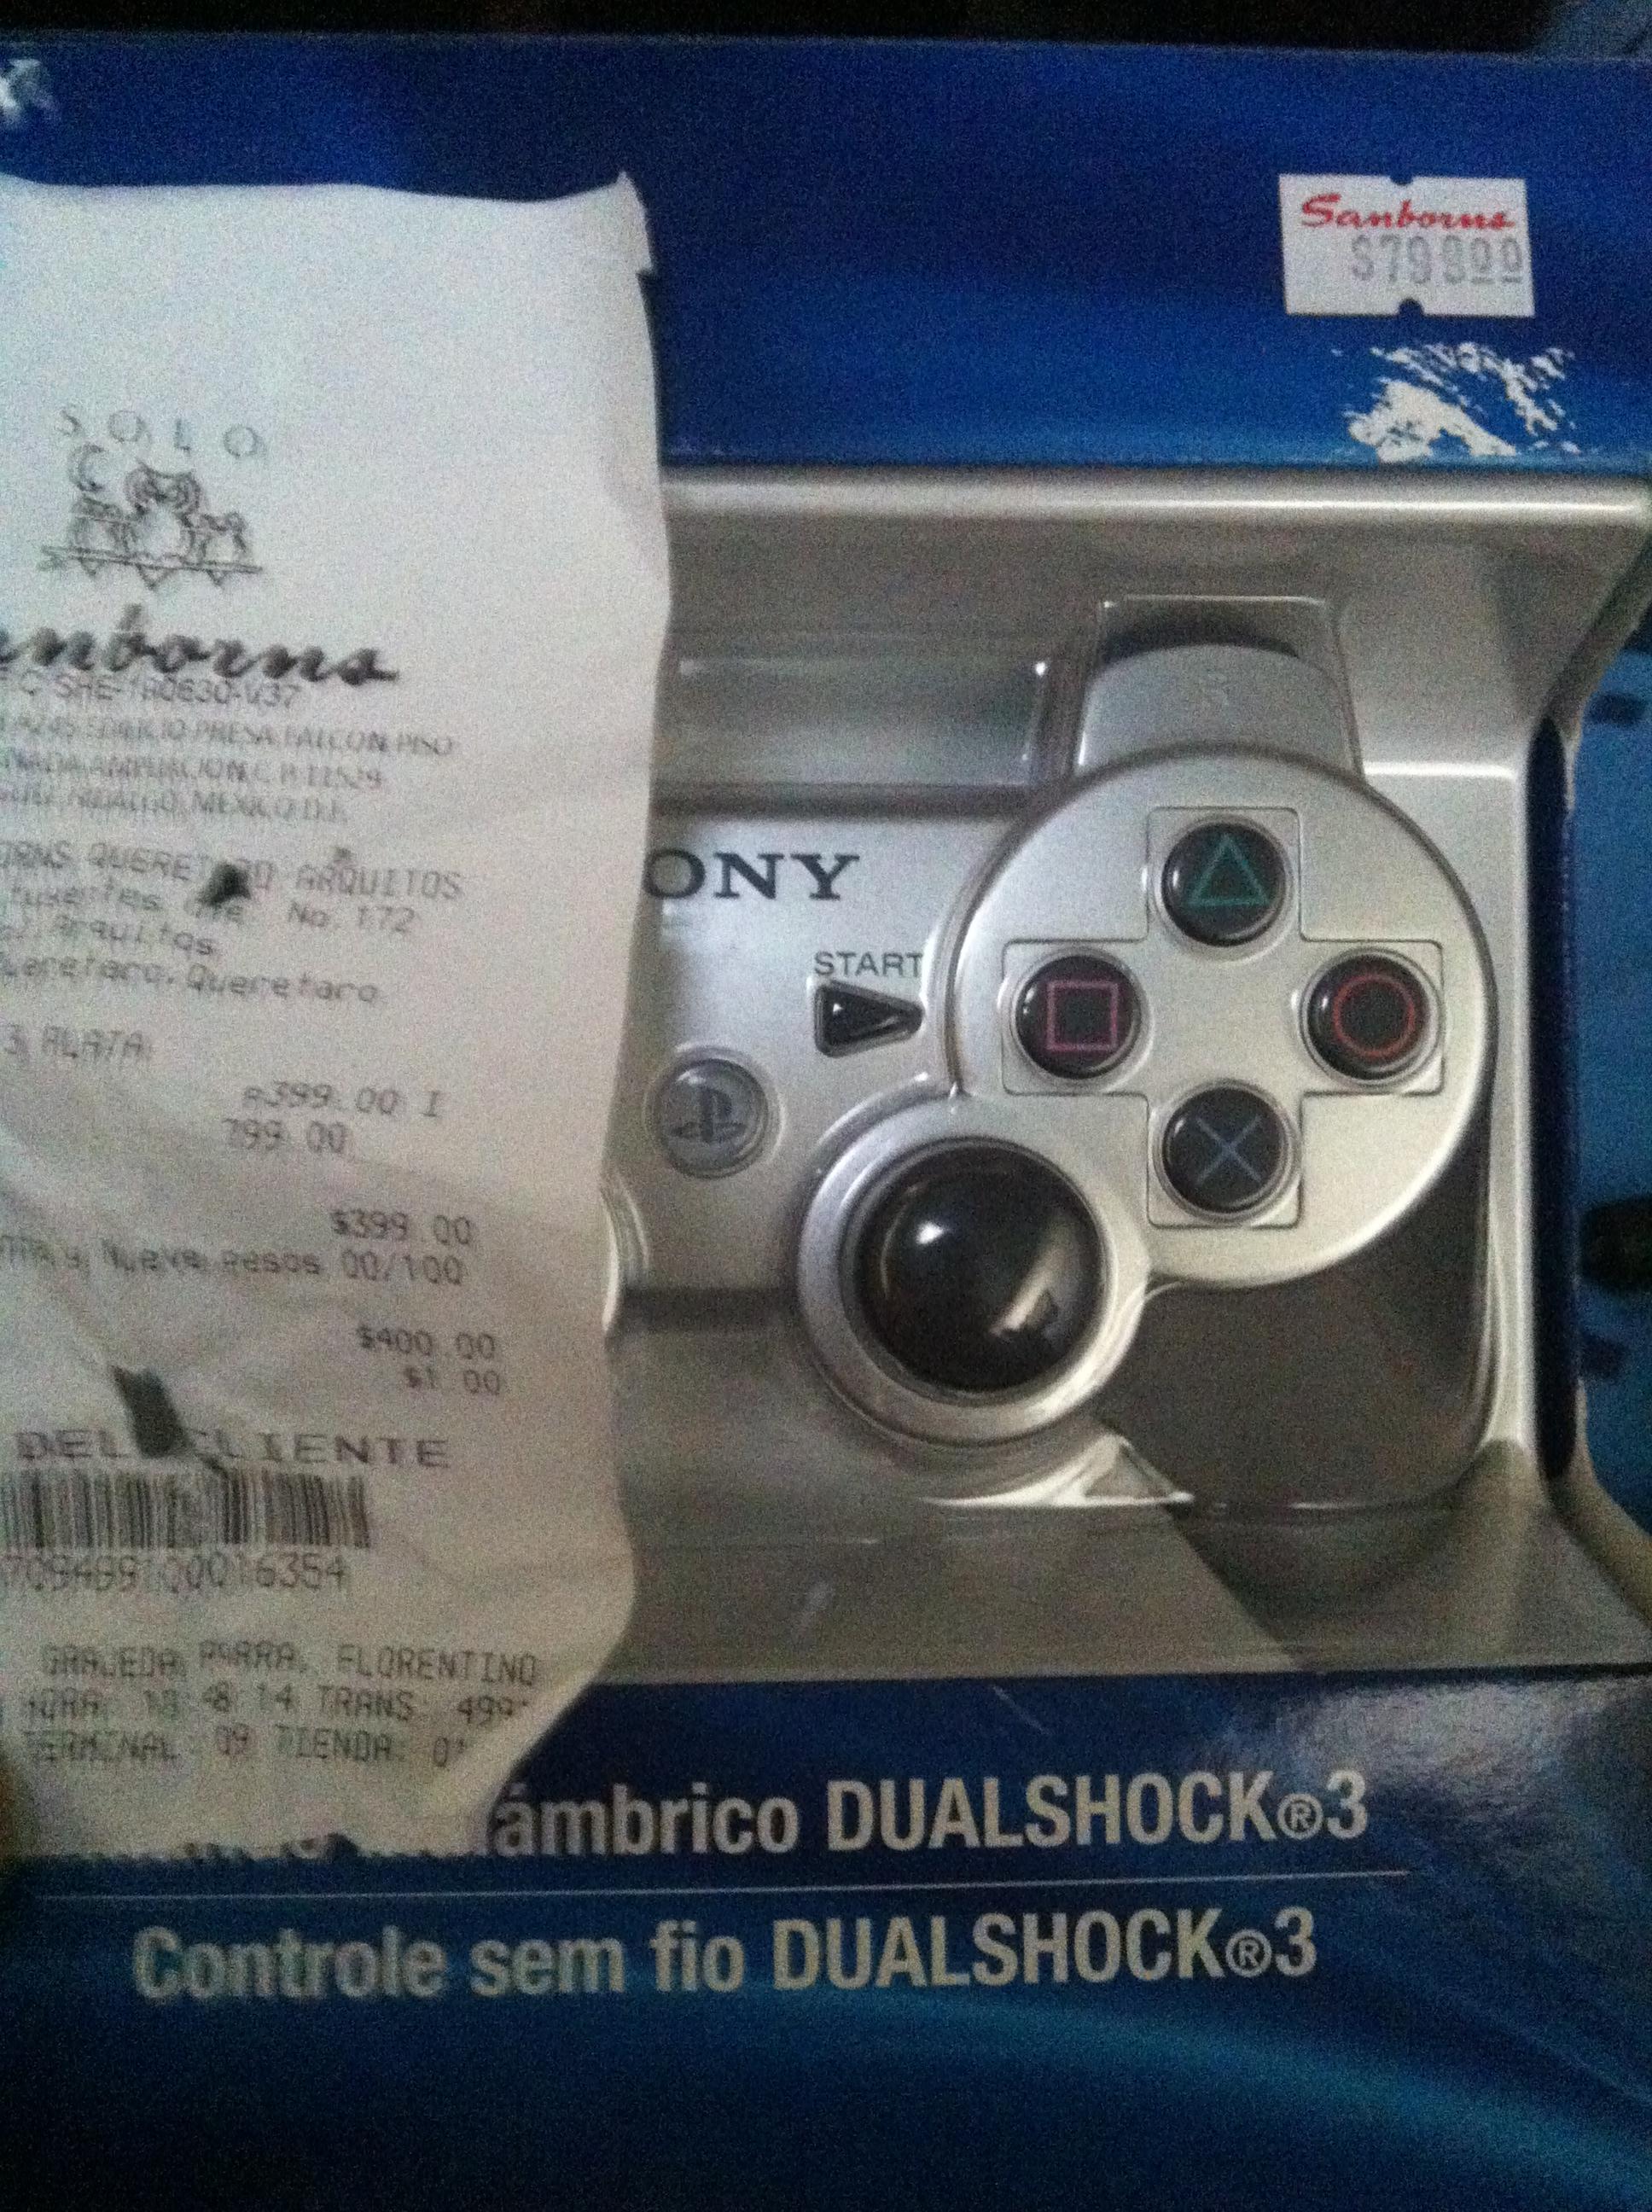 Sanborns: Control PS3 dualshock 3 a $399